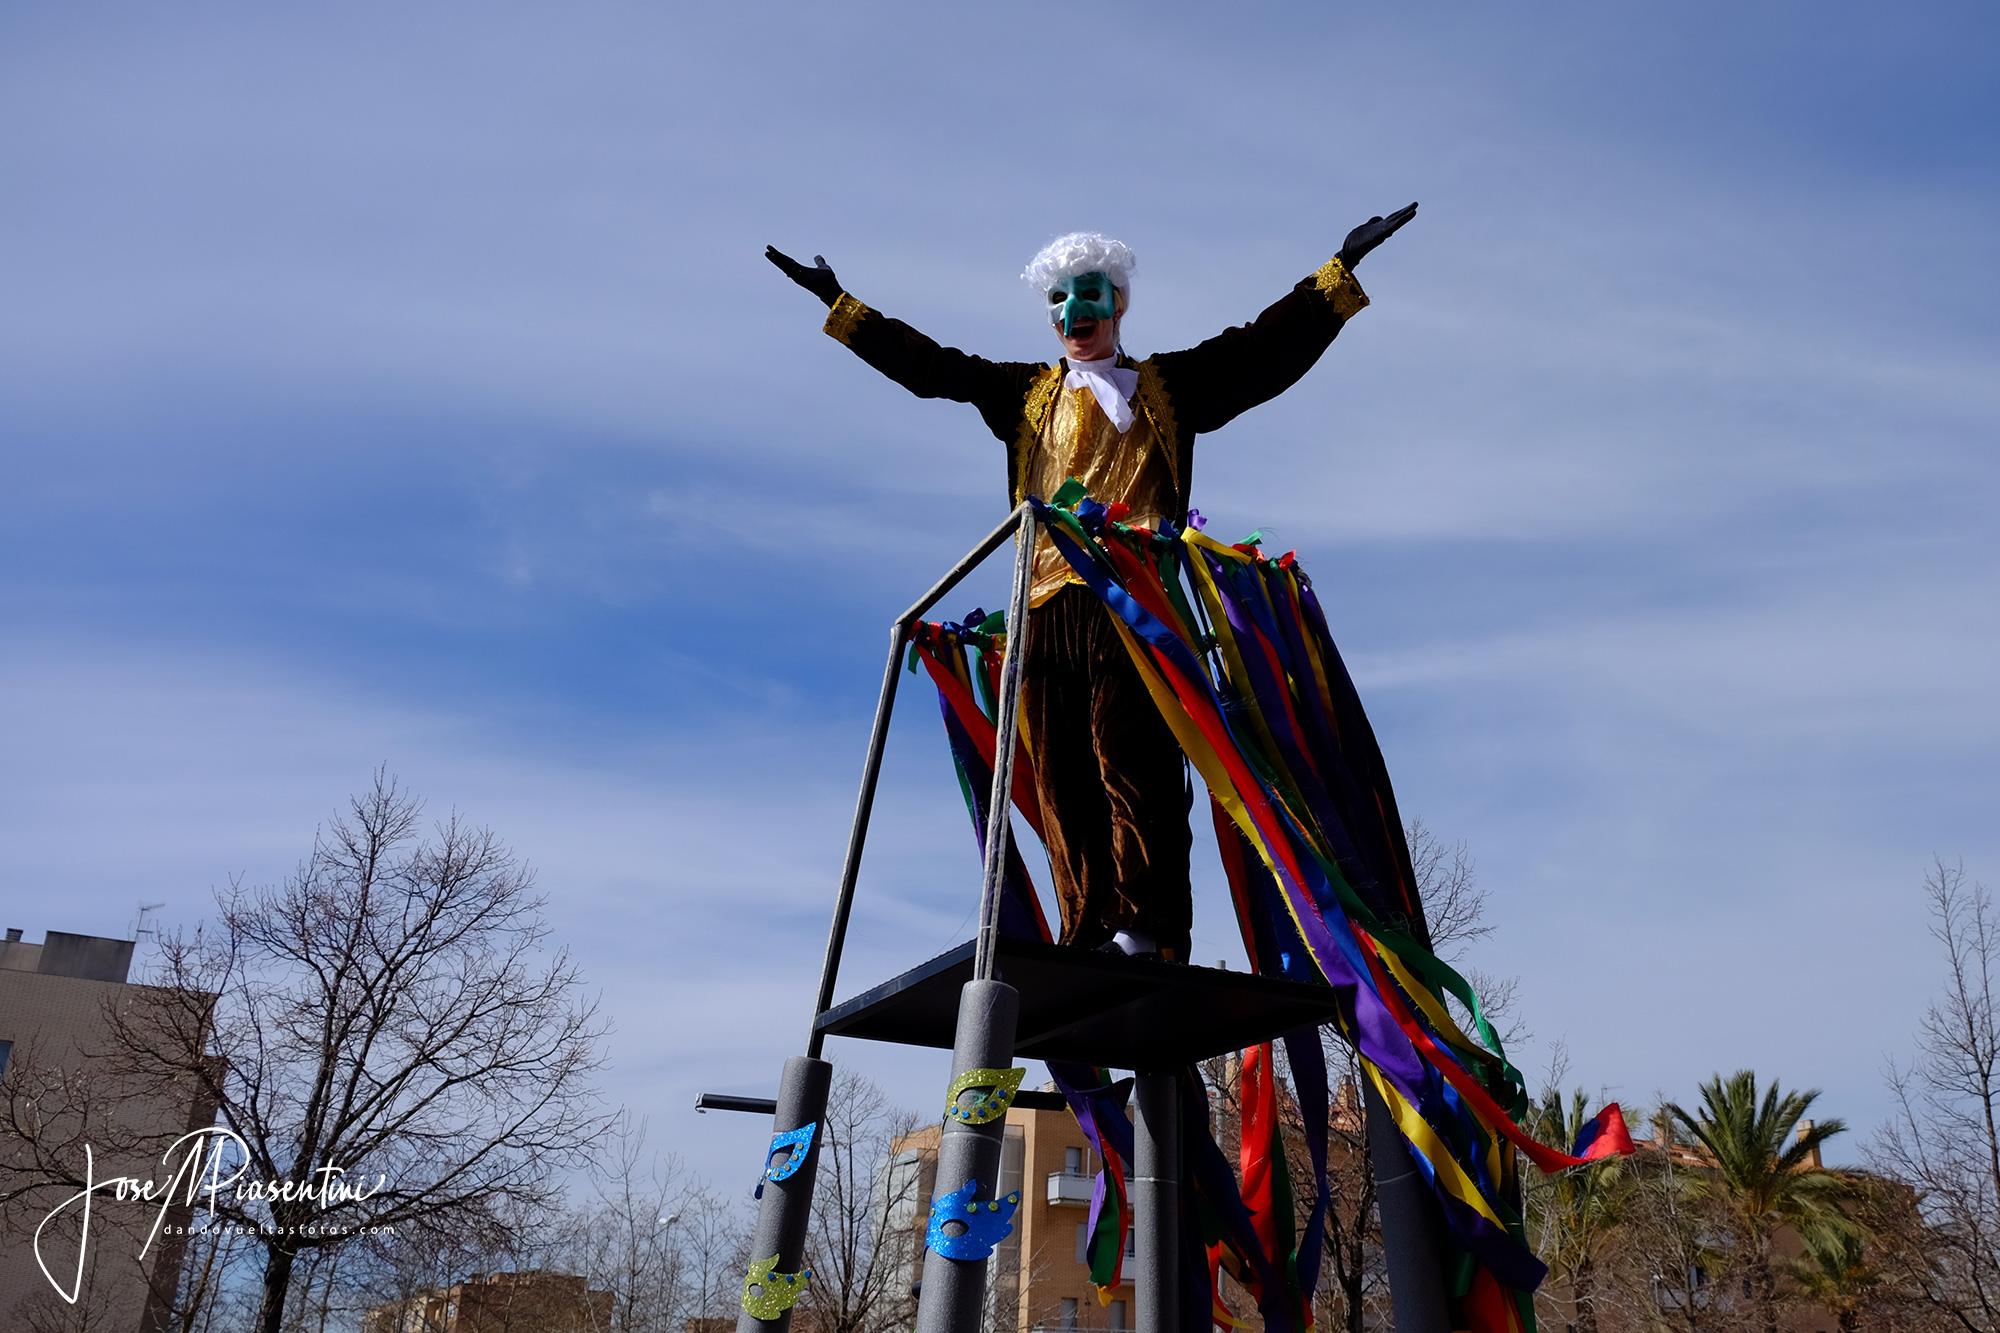 Carrozas carnaval Els Monjos Penedes